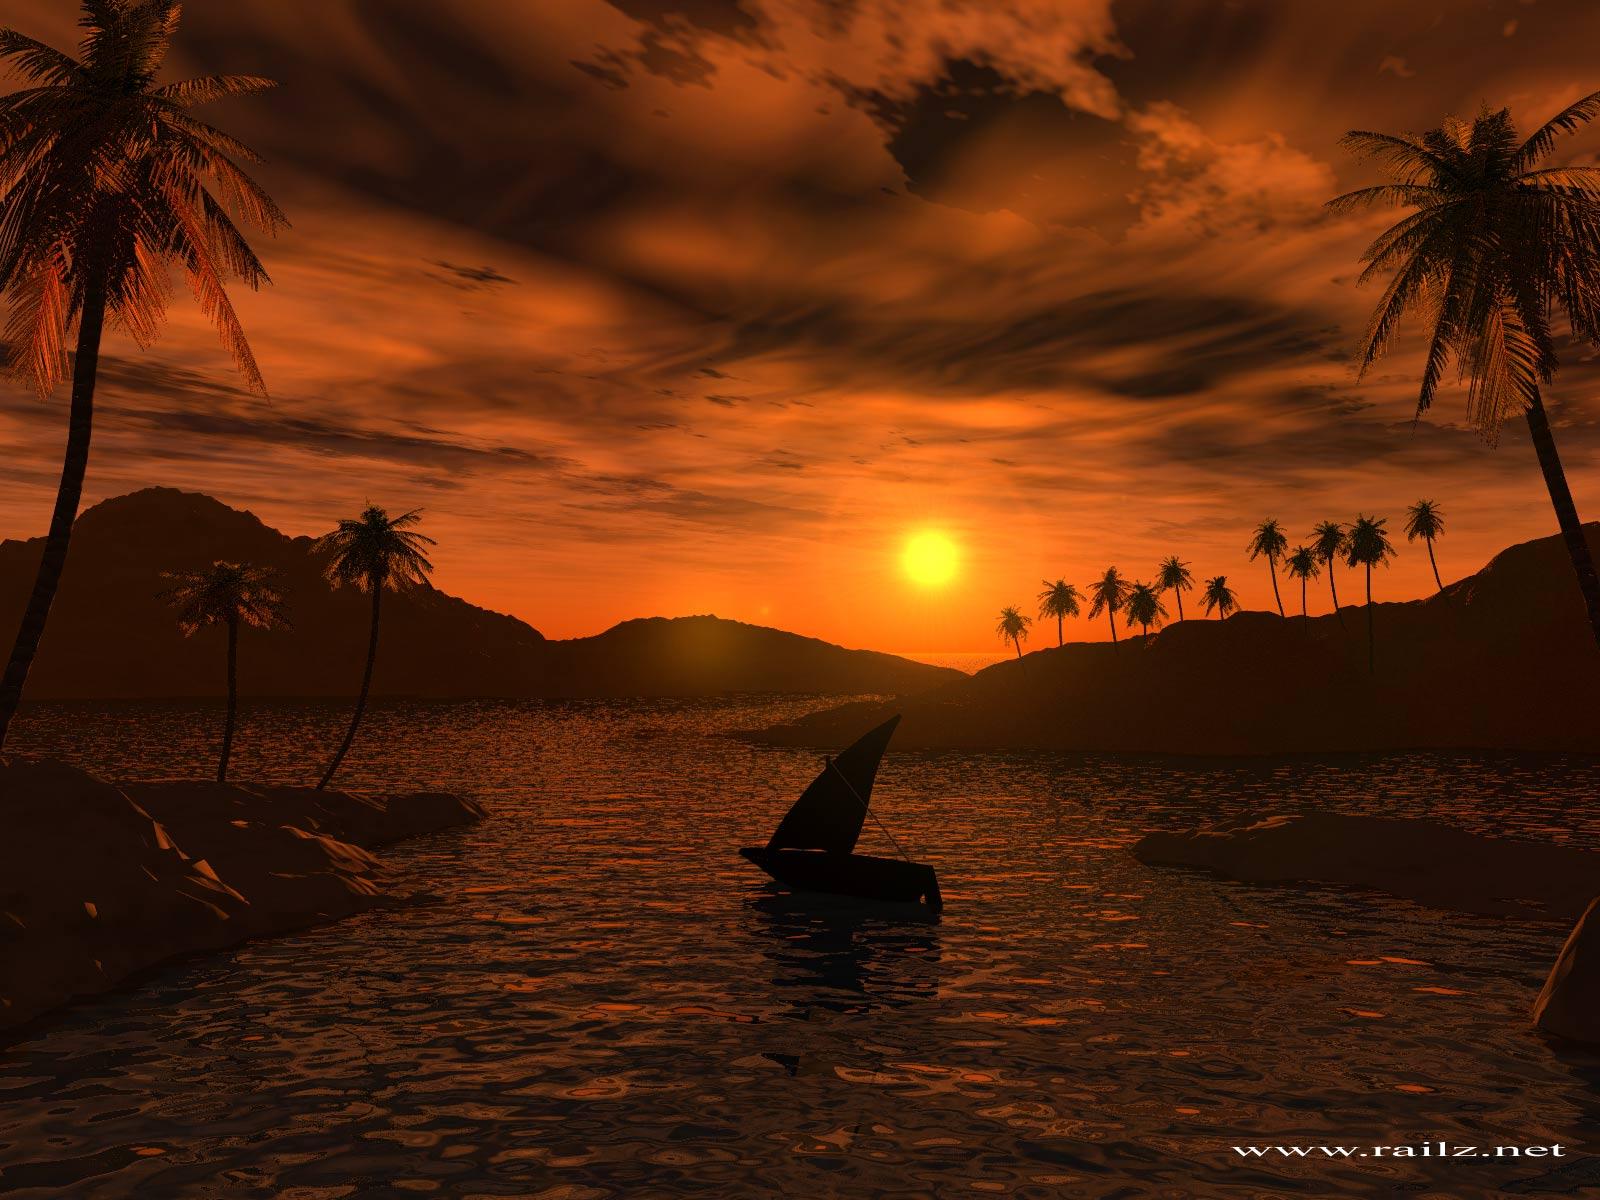 Moving 3D Download Animated Desktop Wallpaper 1600x1200